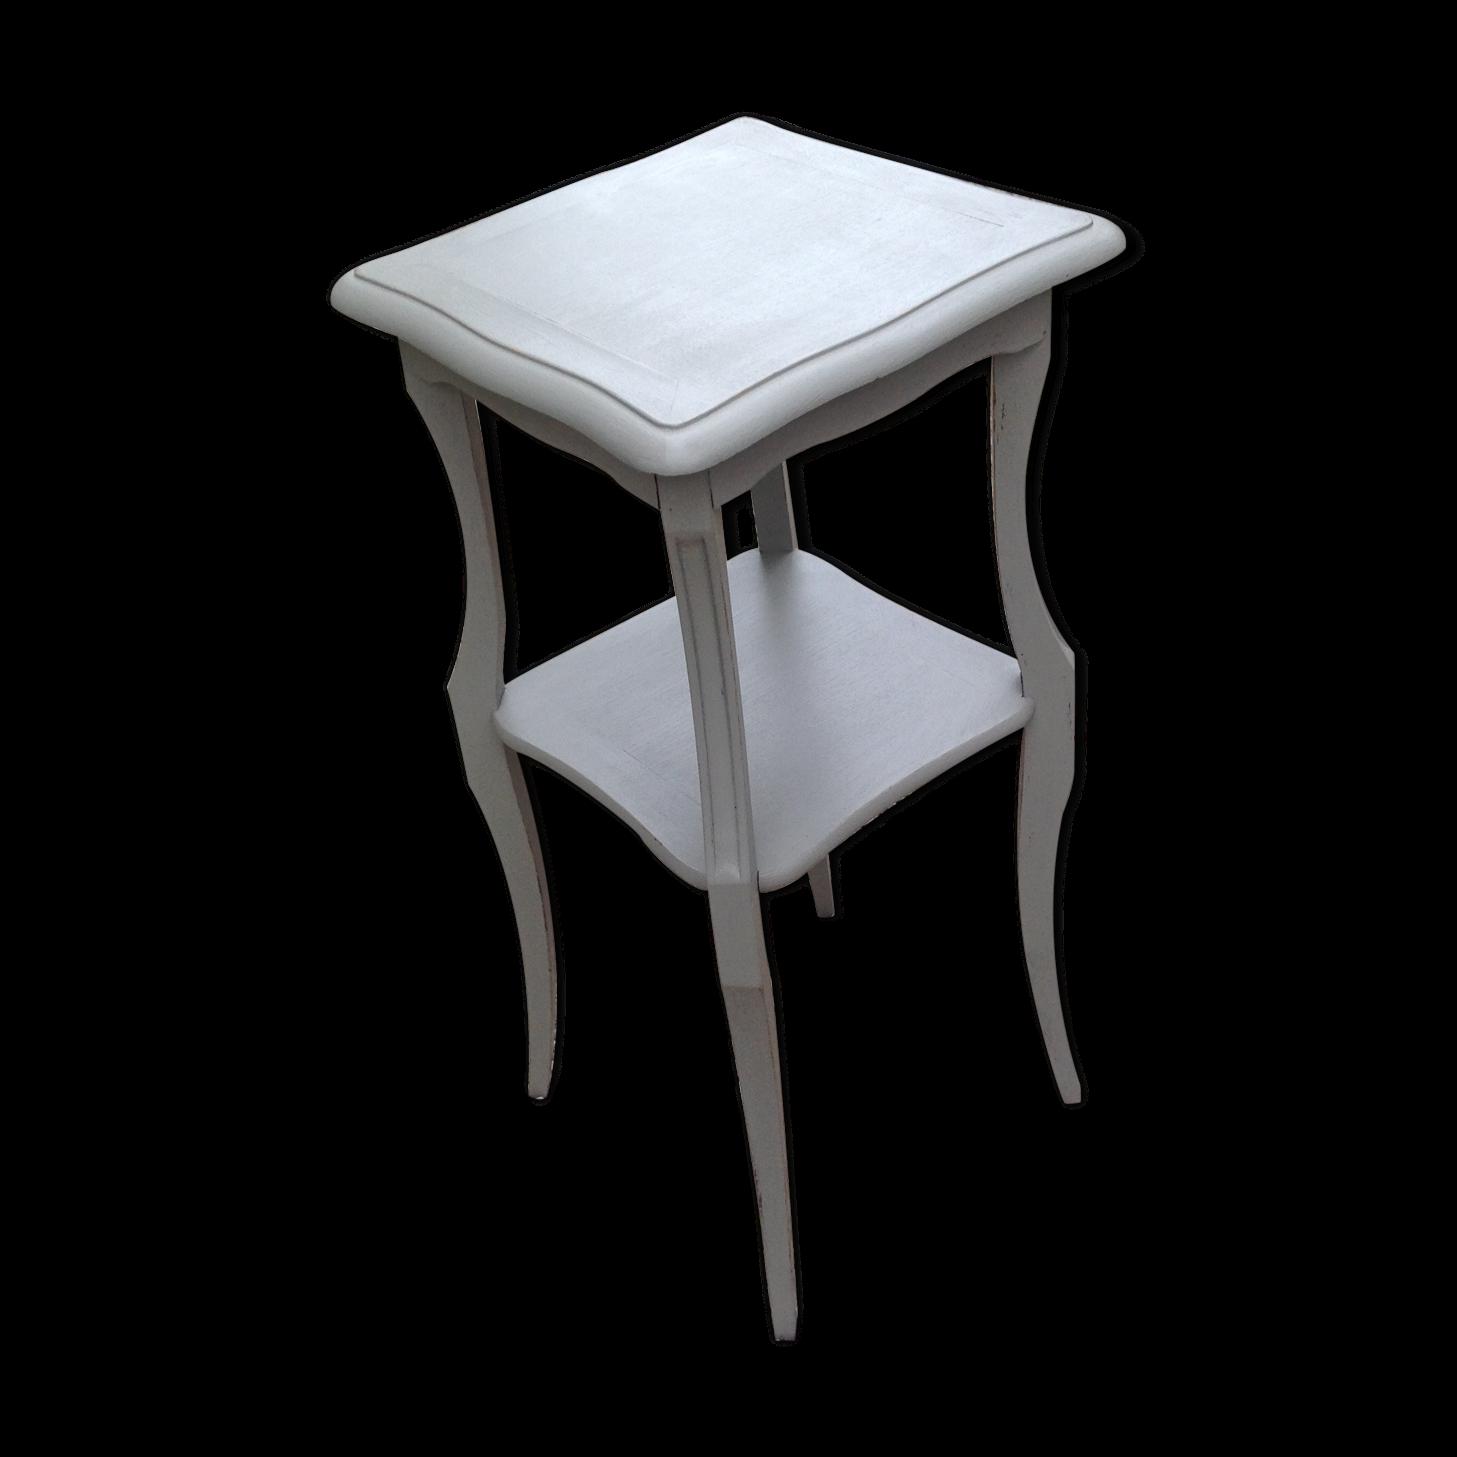 table chevet plexiglas gallery of ikea vikhammer table chevet with table chevet plexiglas. Black Bedroom Furniture Sets. Home Design Ideas